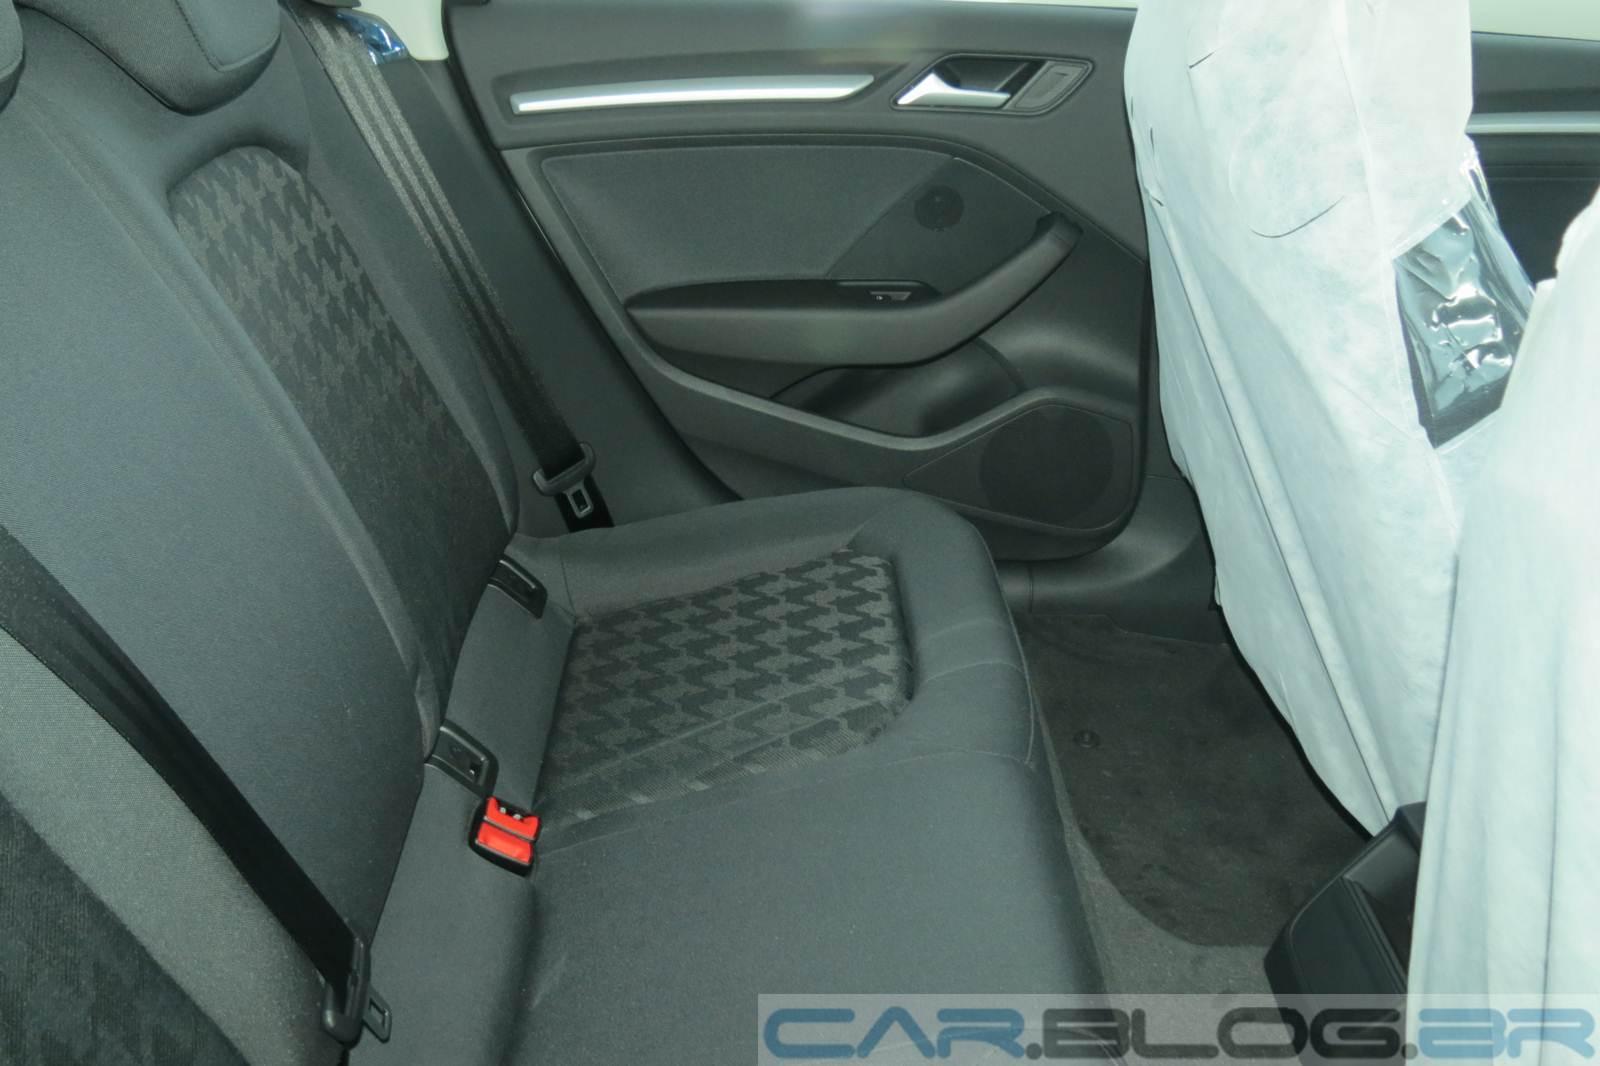 Audi A3 Sedan 1.4 Attraction - interior